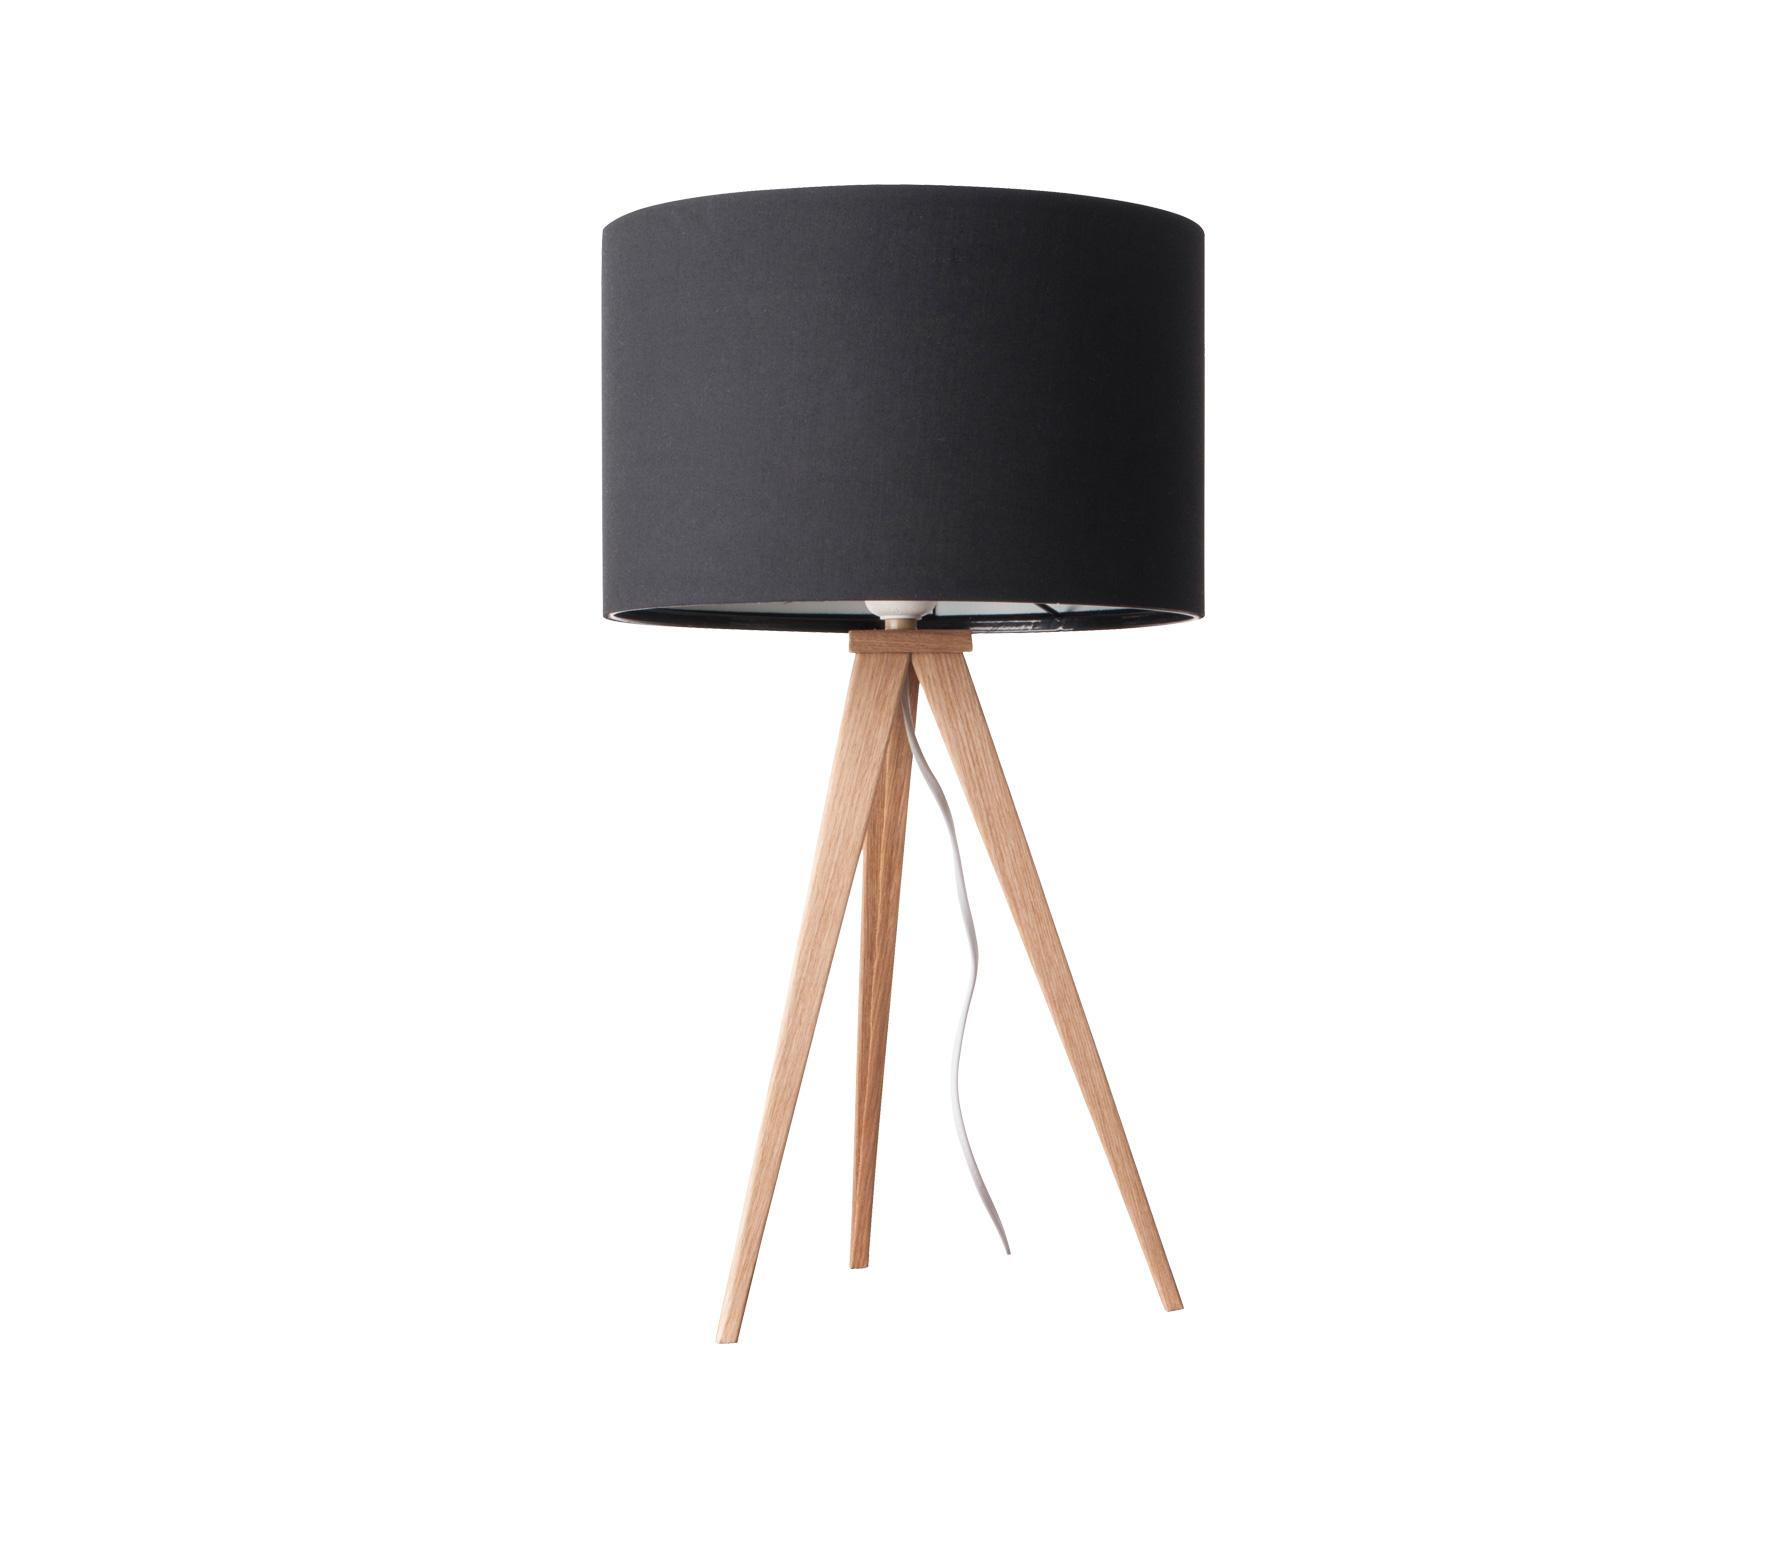 Zuiver Tripod tafellamp hout/stof blank/zwart